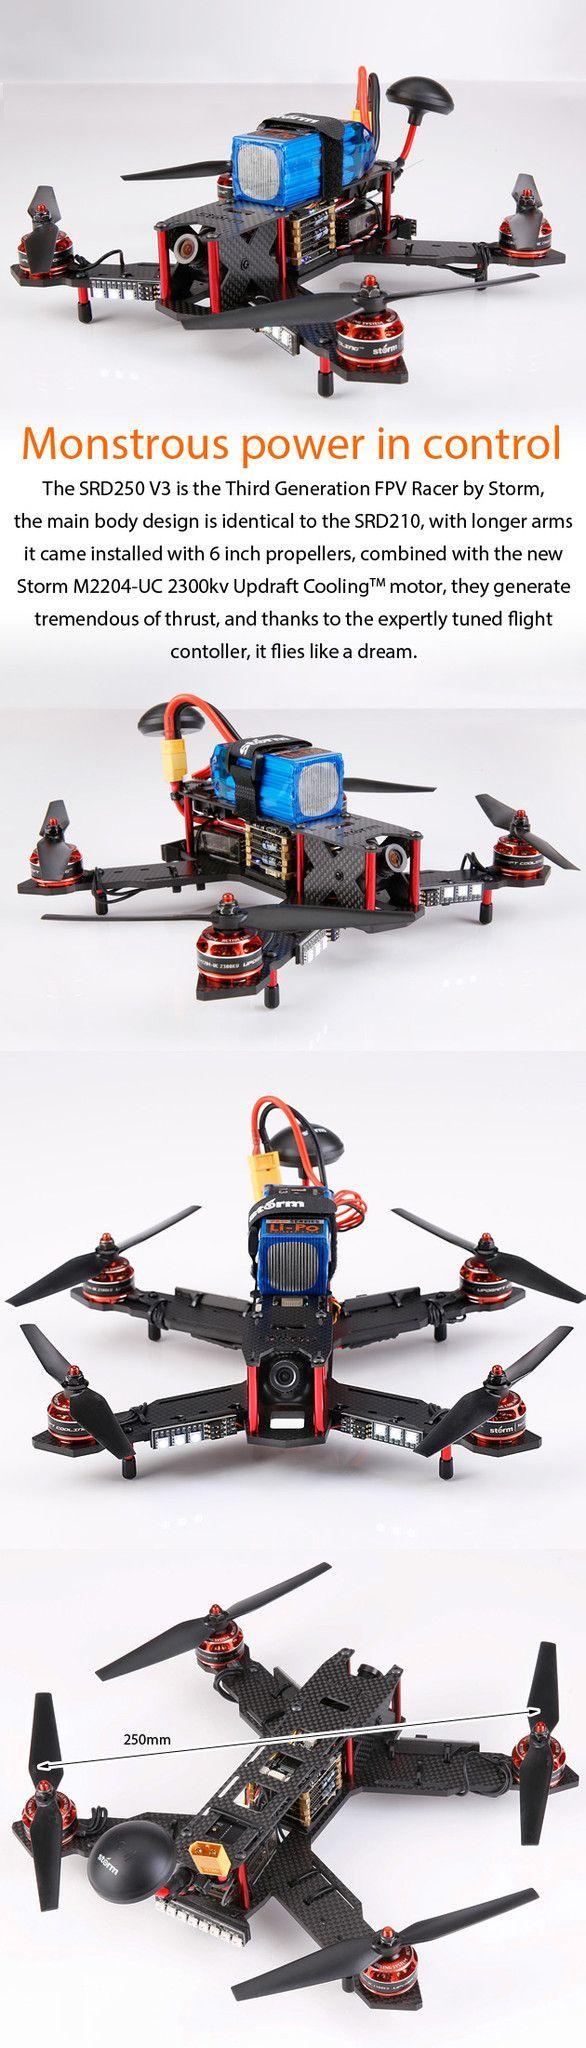 Storm Racing Drone Rtf Srd250 V3 Tbs Powercube In 2019 Naze32 Wiring Diagram